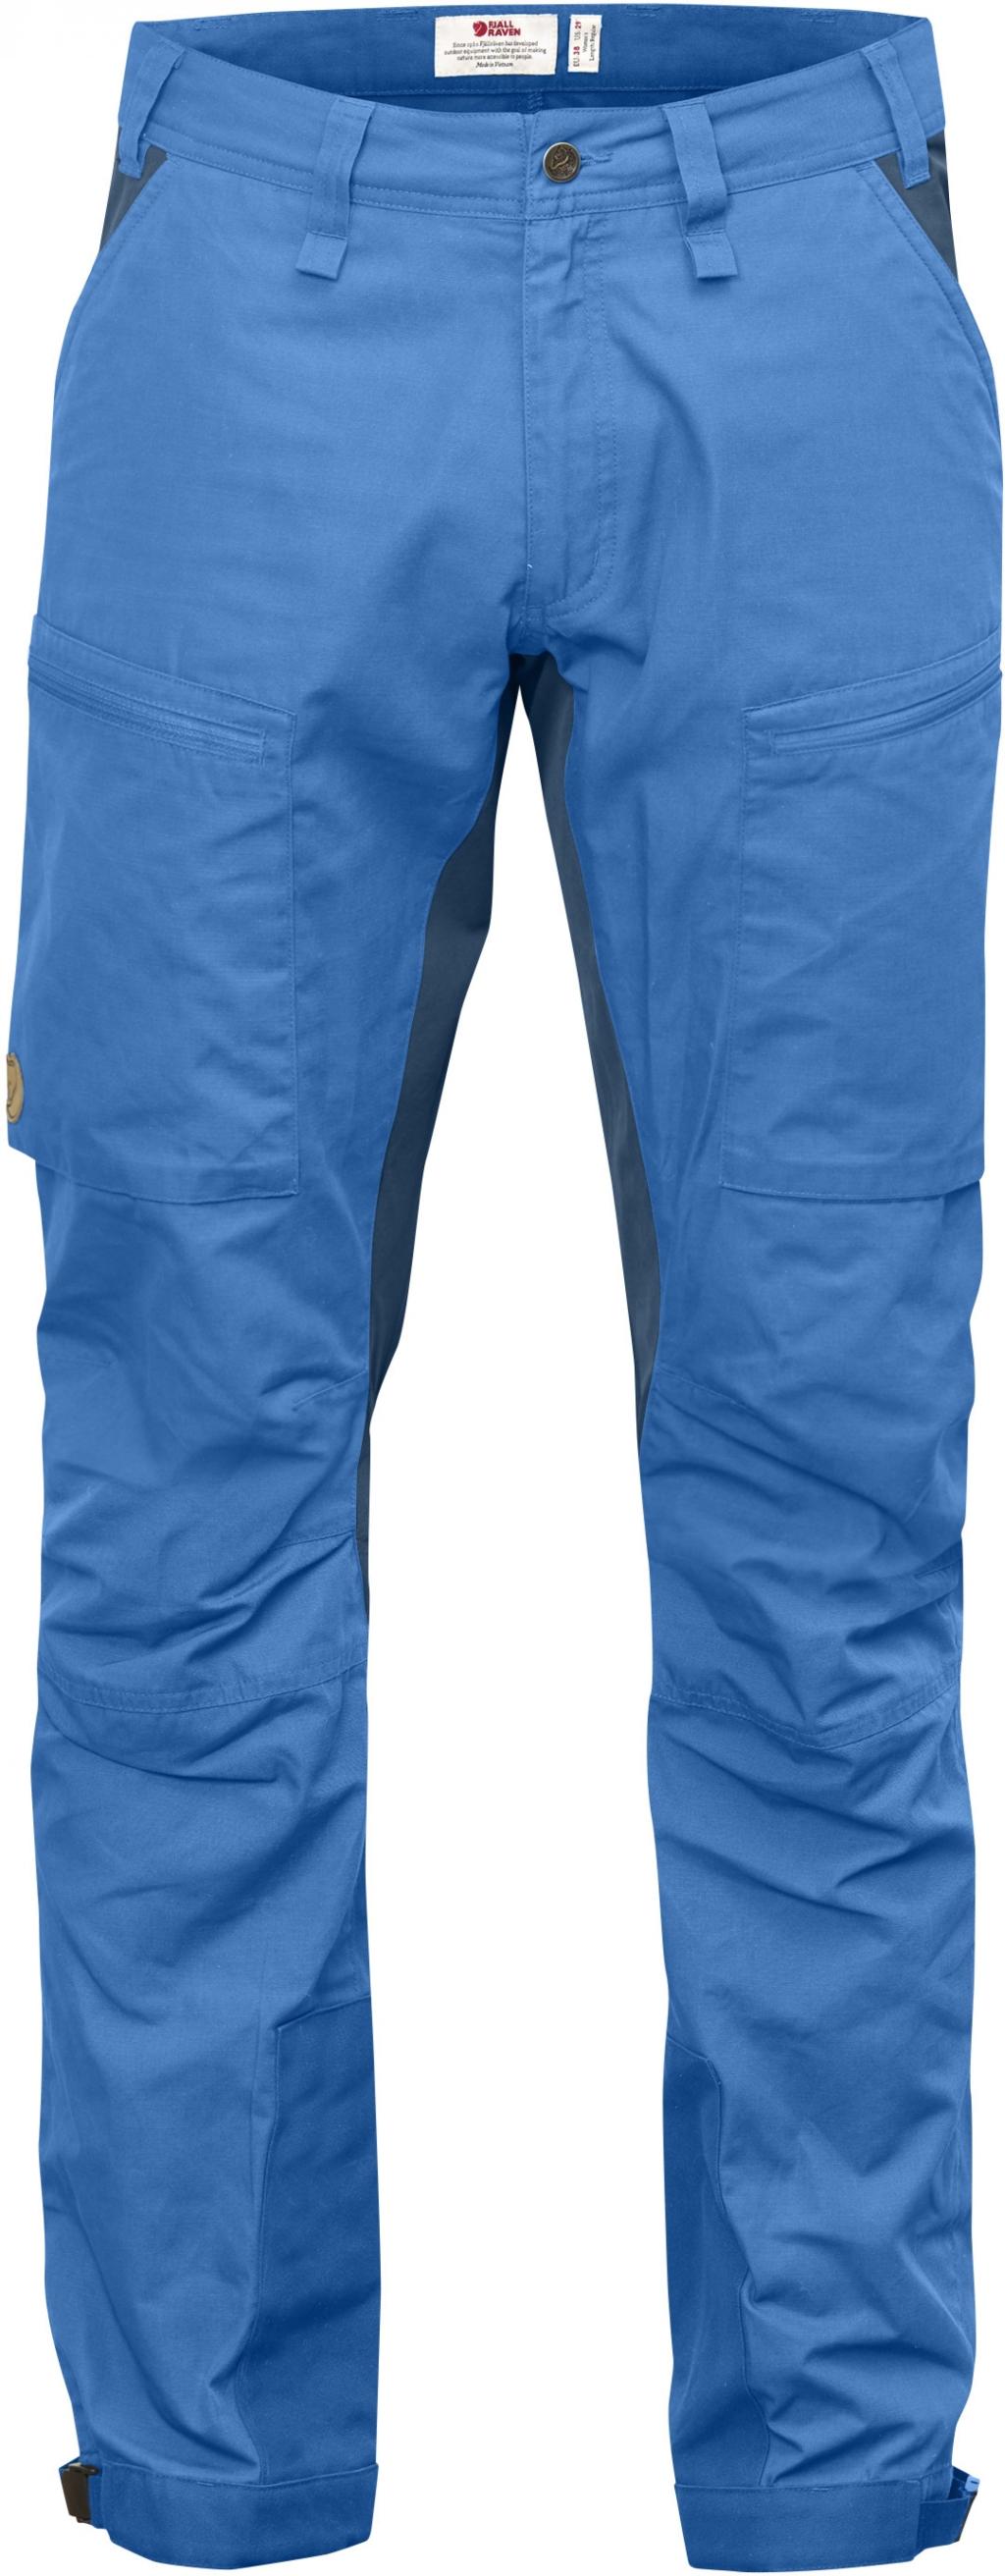 FjallRaven Abisko Lite Trekking Trousers UN Blue-30